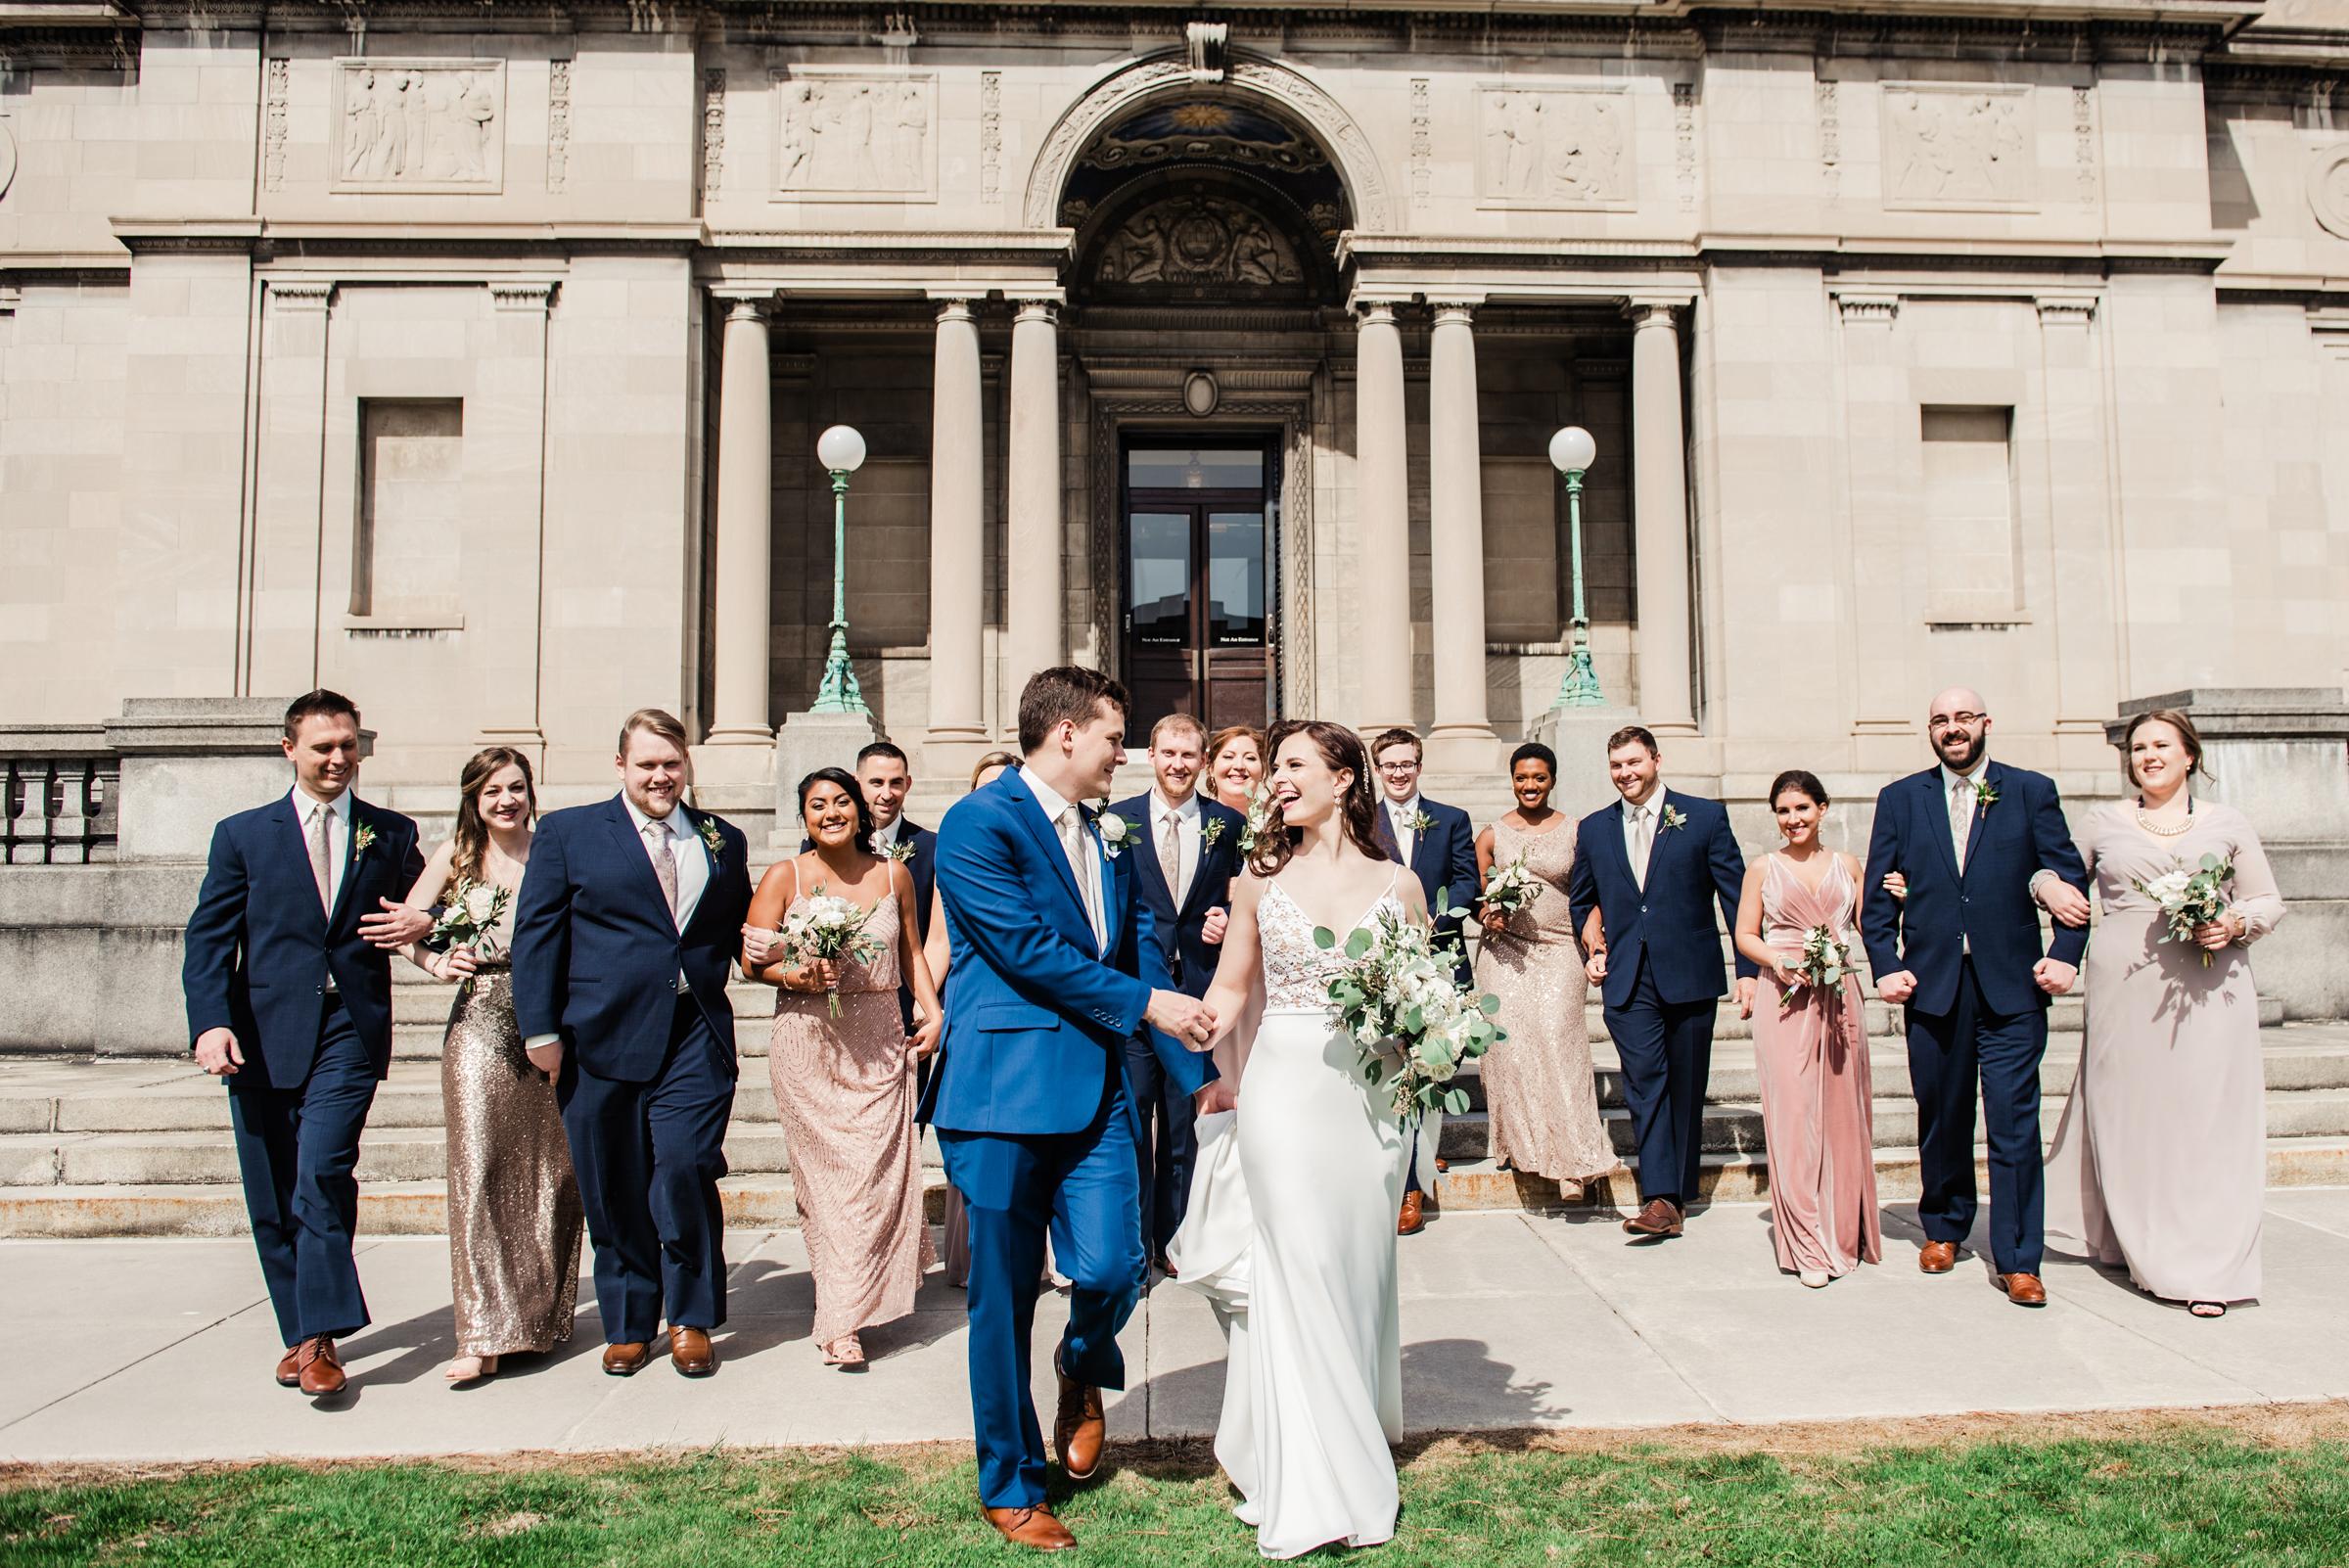 The_Arbor_LoftRochester_Wedding_JILL_STUDIO_Rochester_NY_Photographer_145717.jpg